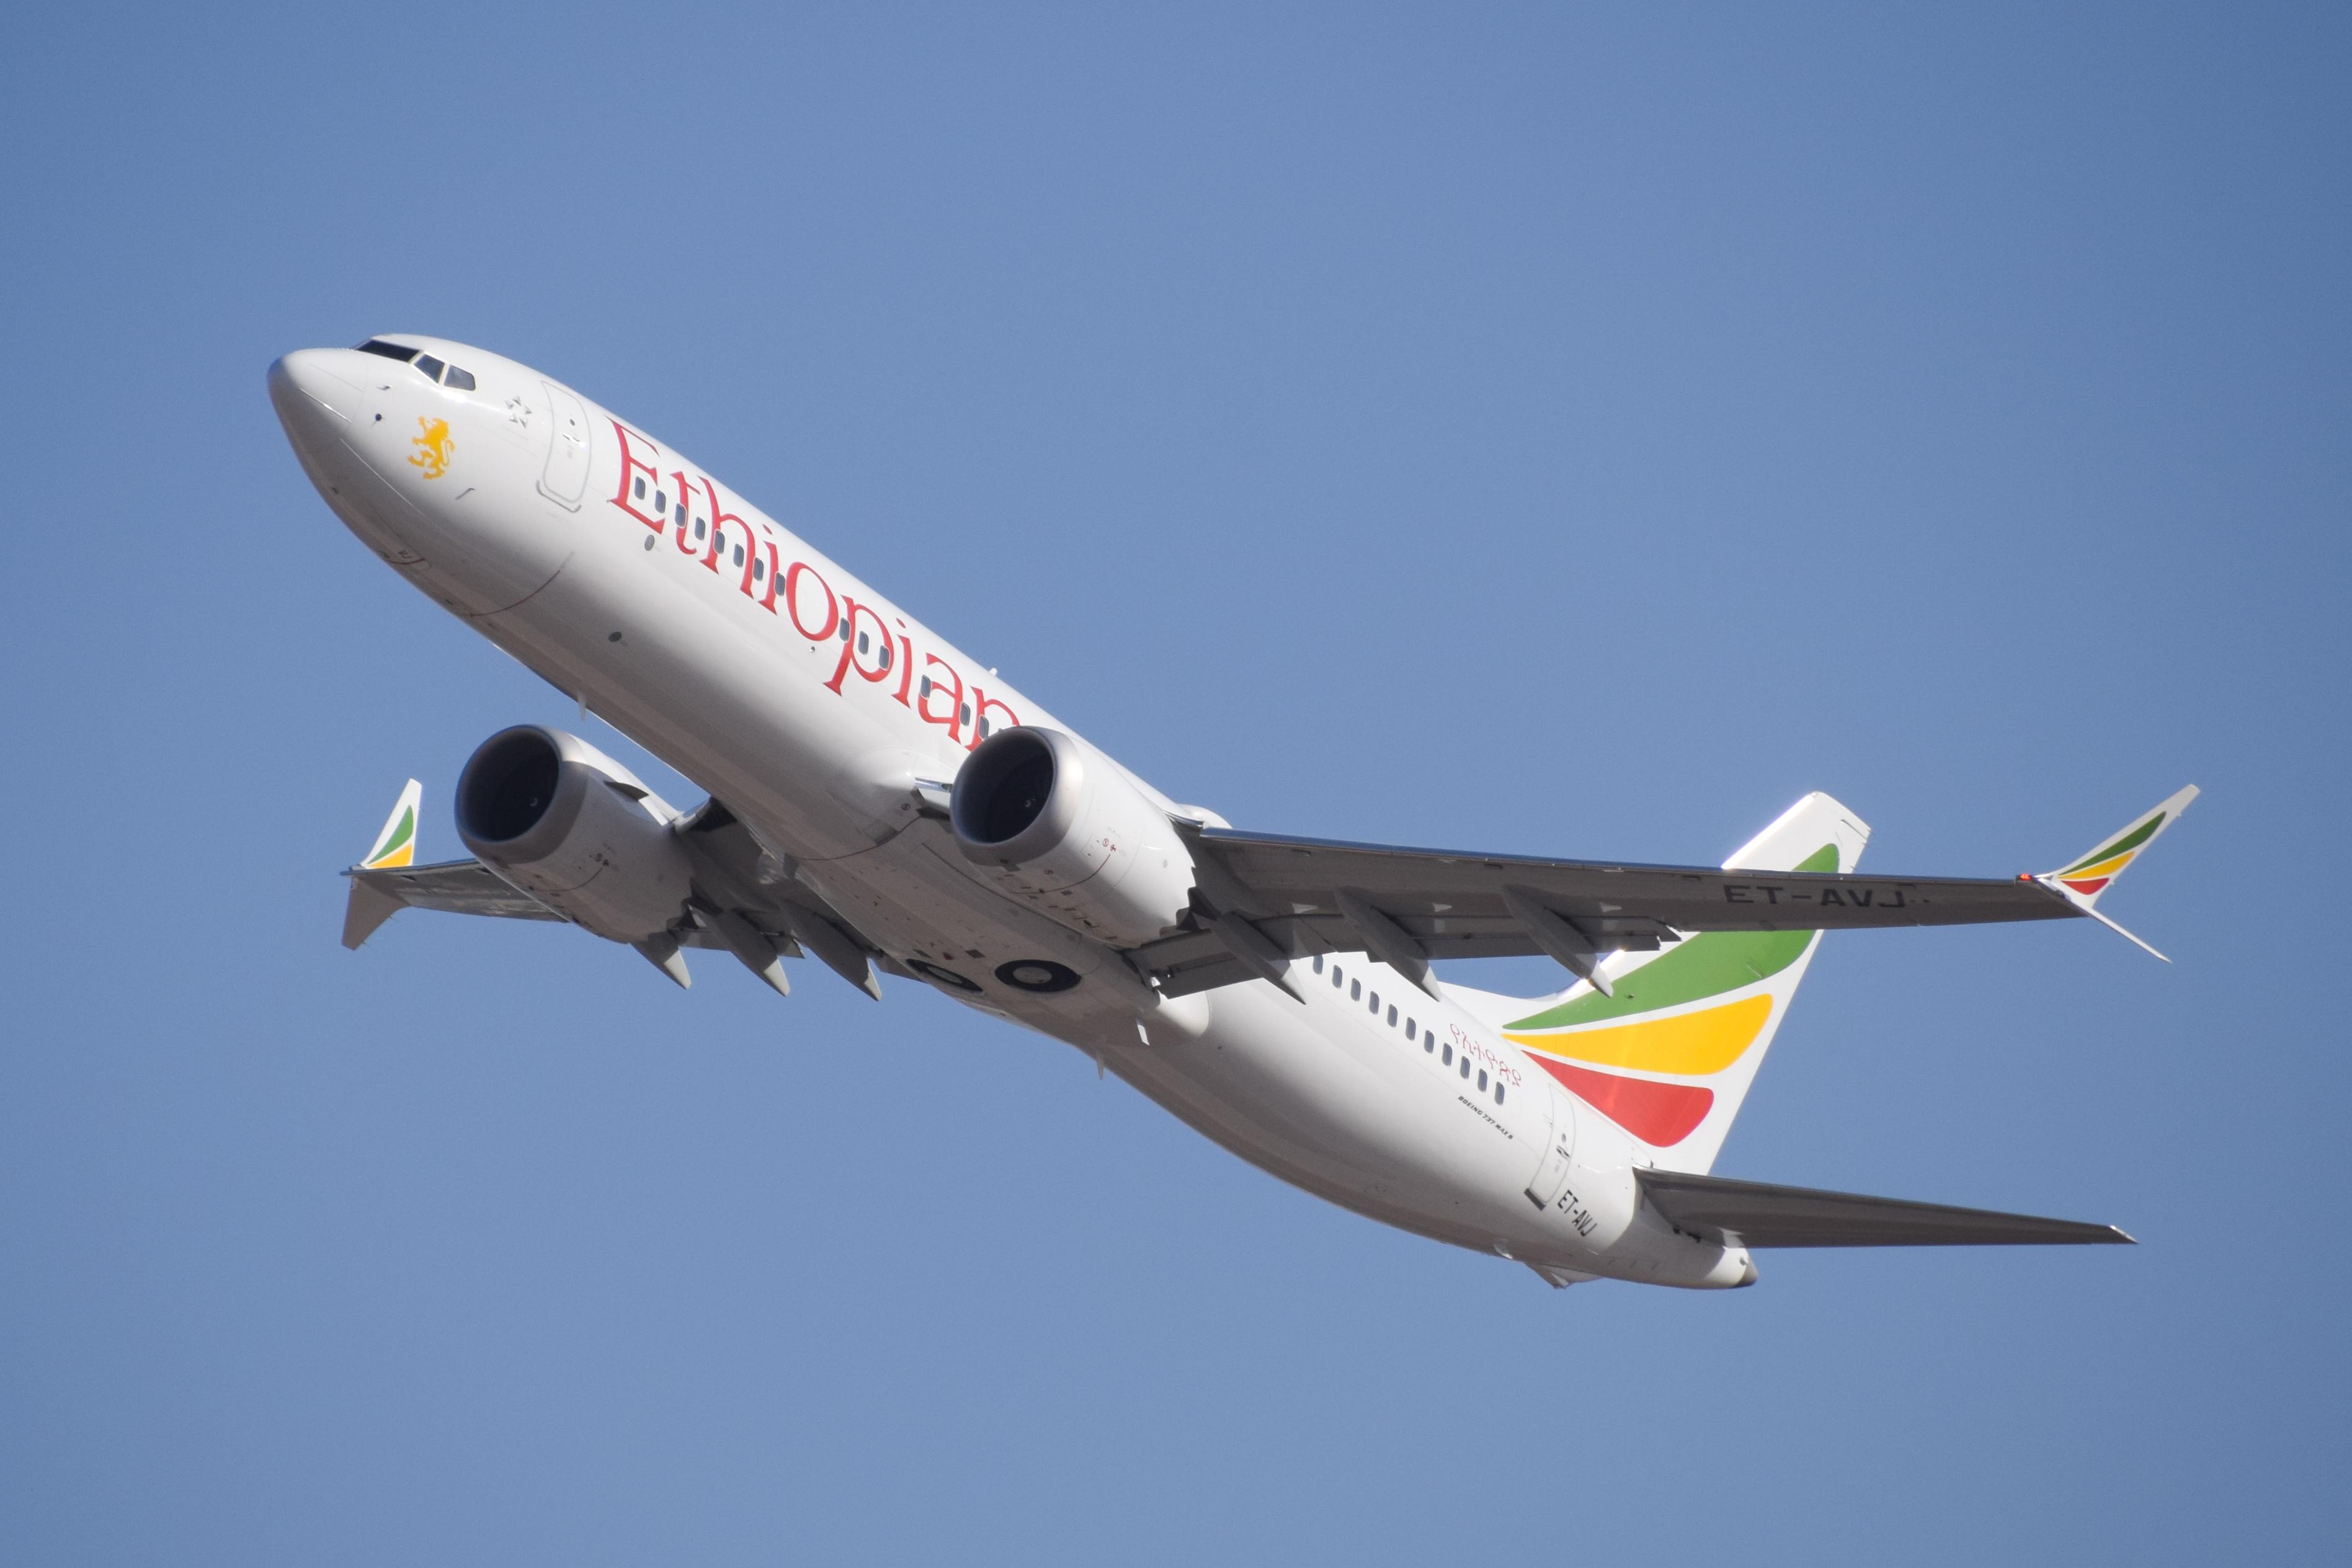 Ethiopian_Airlines_ET-AVJ_takeoff_from_TLV_(46461974574)